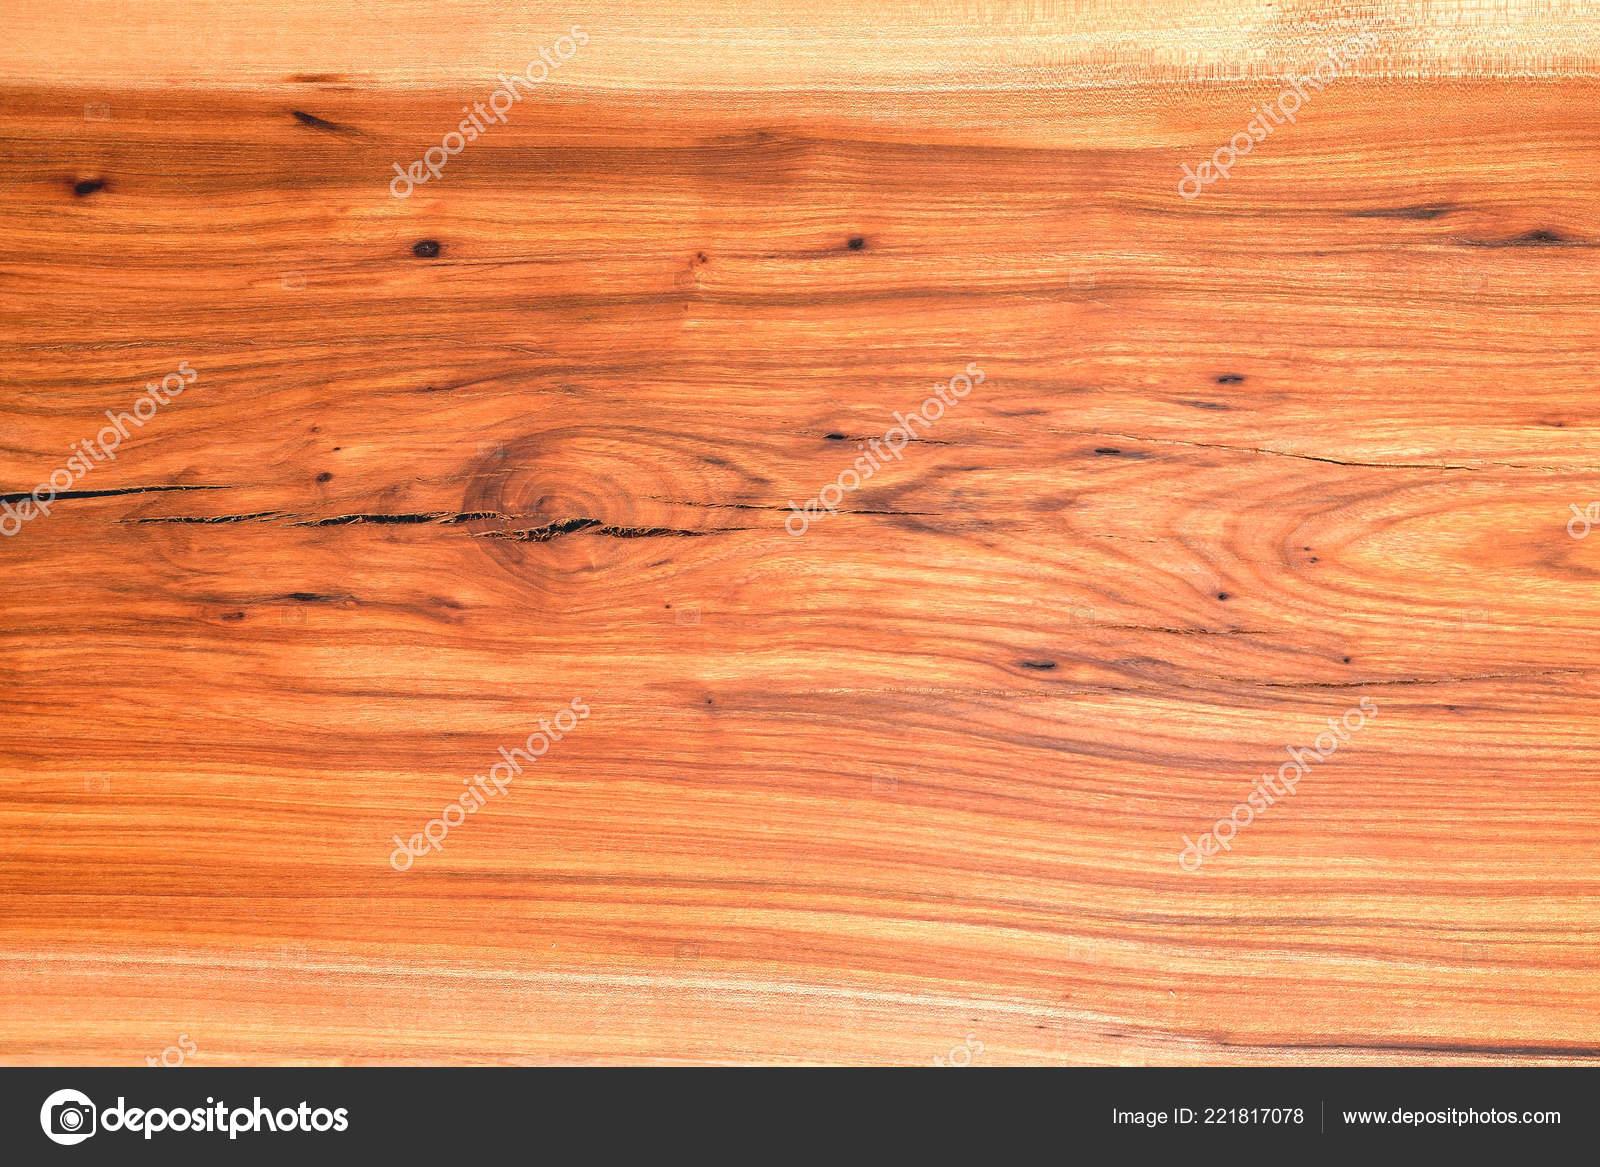 Wooden Natural Background Brown Color Heterogeneous Texture